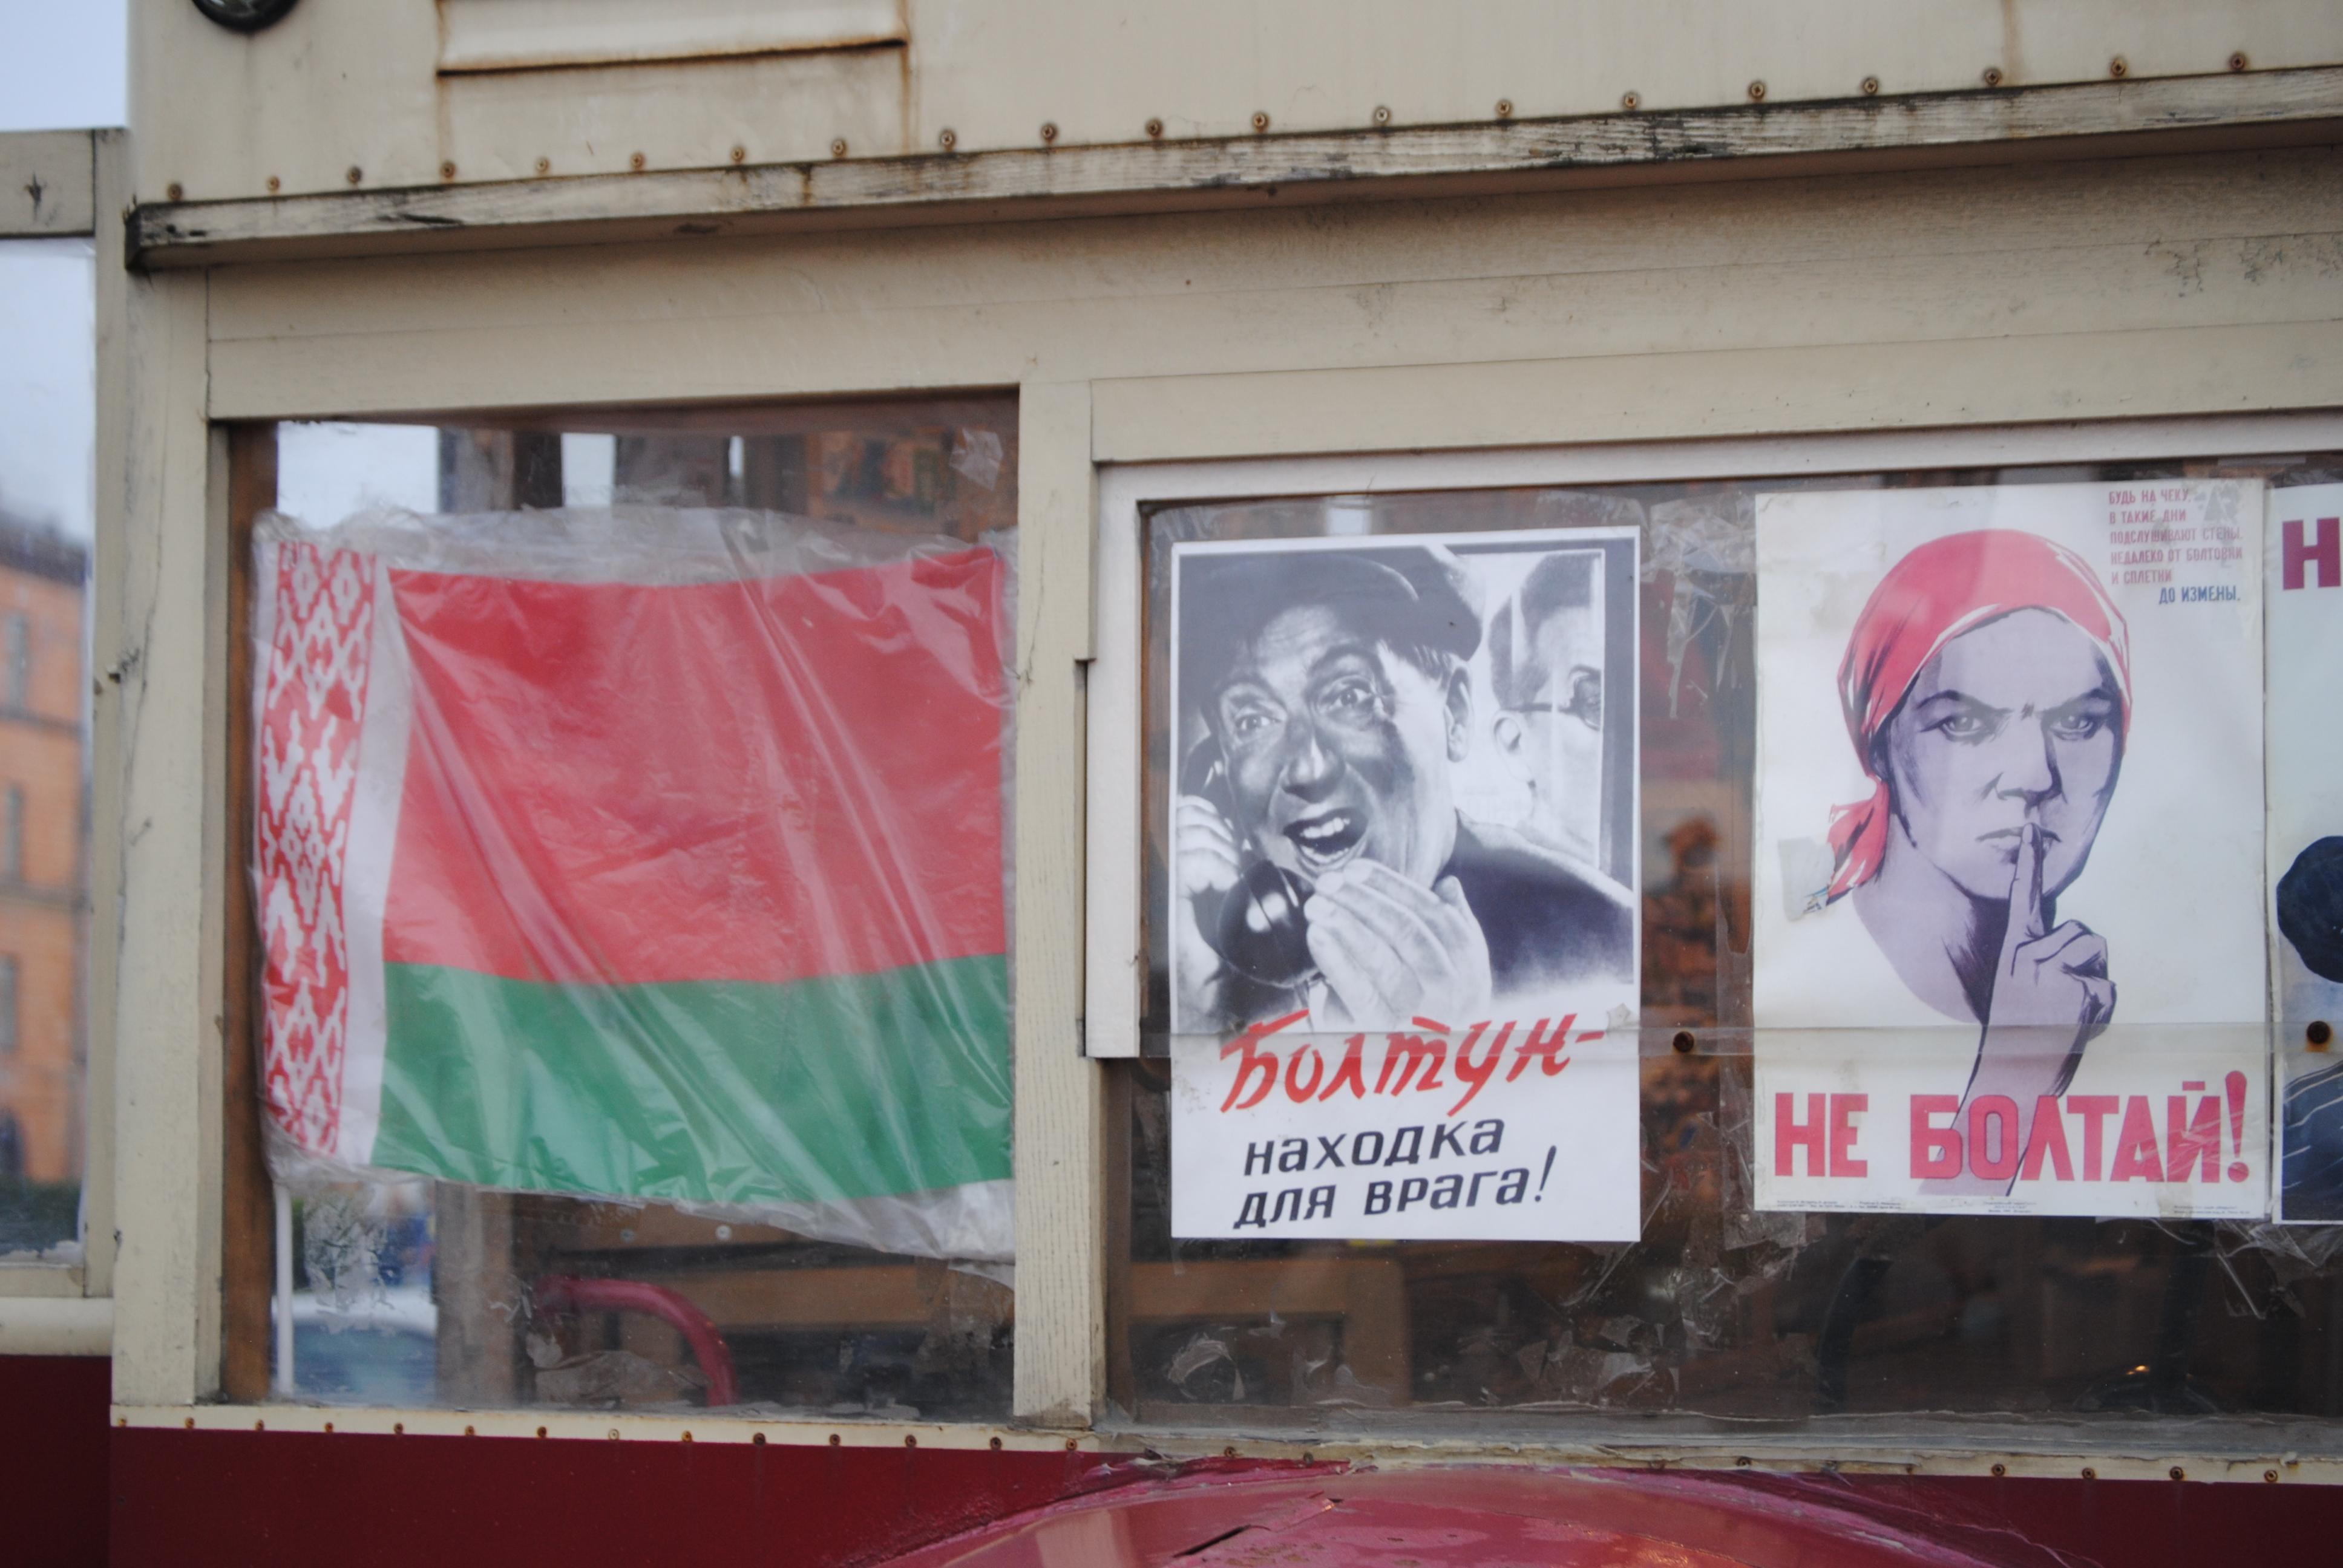 Parada de souvenirs soviéticos en el centro de Minsk